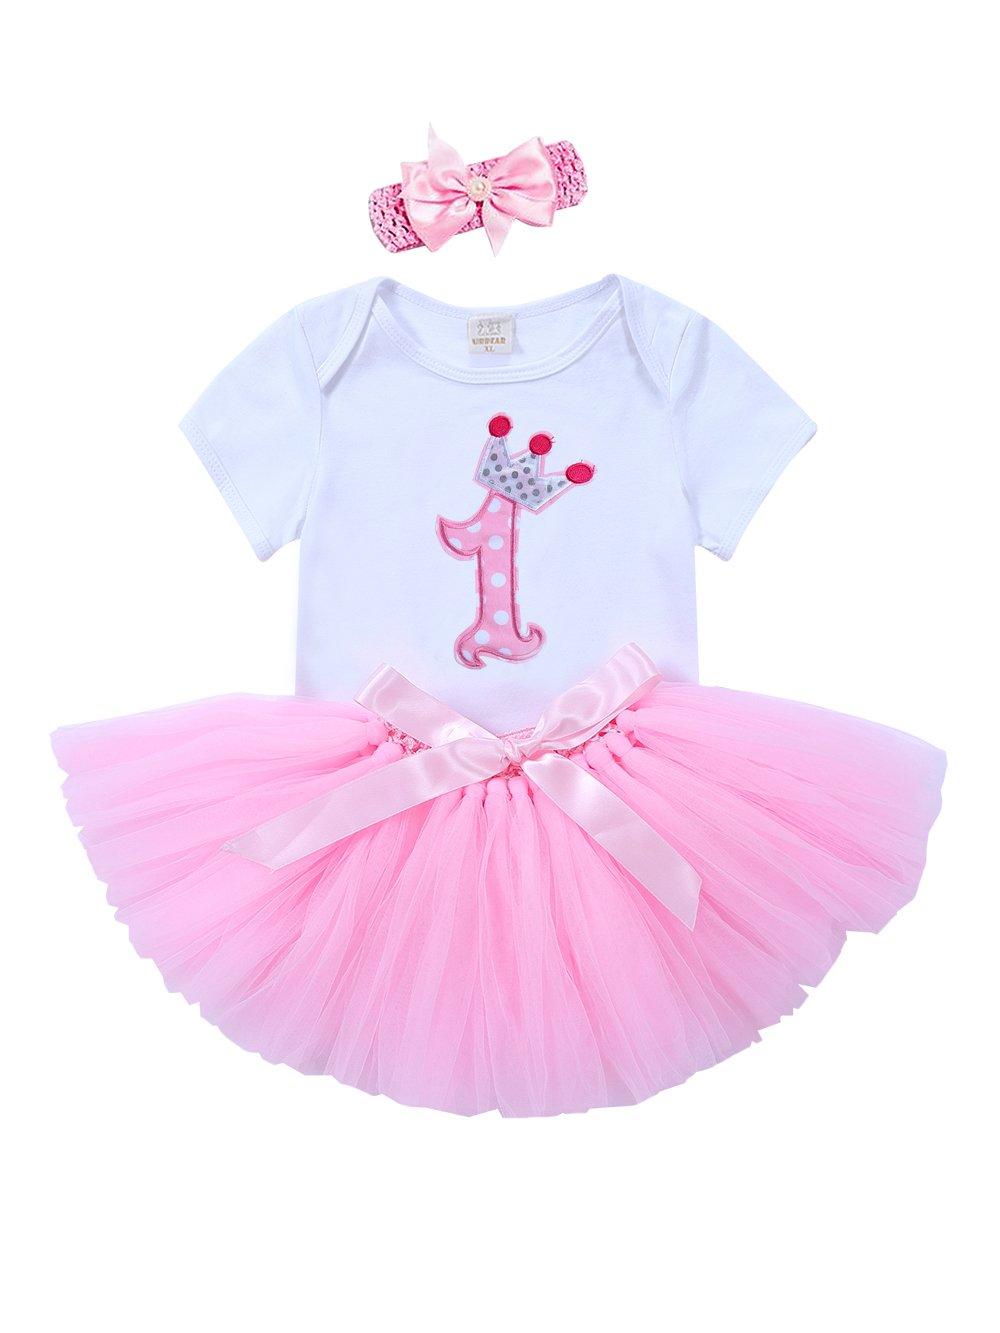 URBEAR 3pcs Baby Mädchen 1. Geburtstag Kleidung Body Strampler + Tüllrock + Haarband Rosa Rock Outfits, 12-24 Monate A80601FH-D1XL